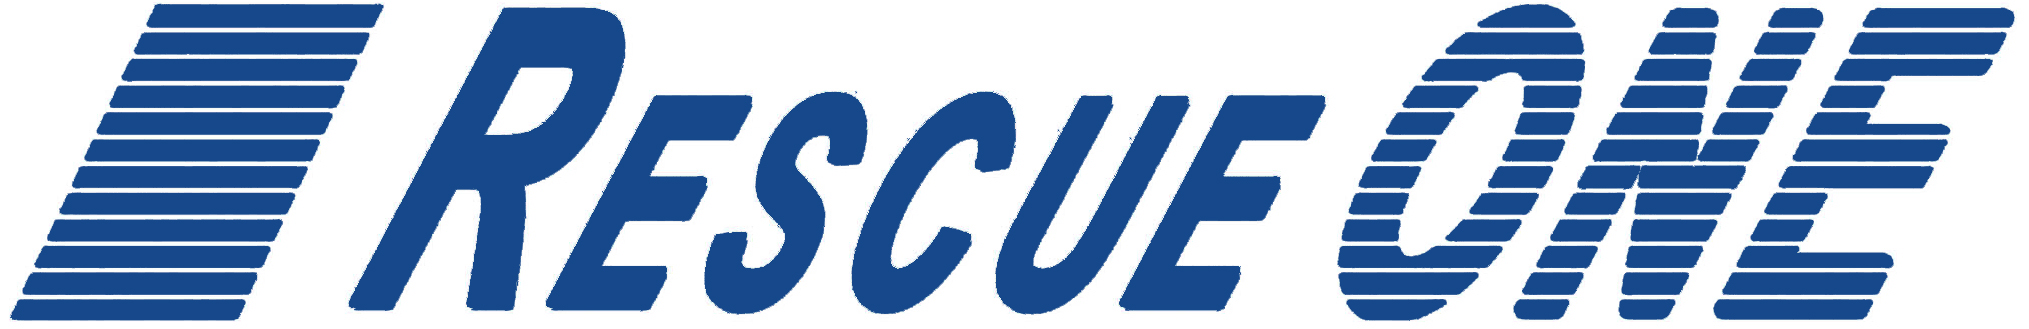 Rescue ONE Logo